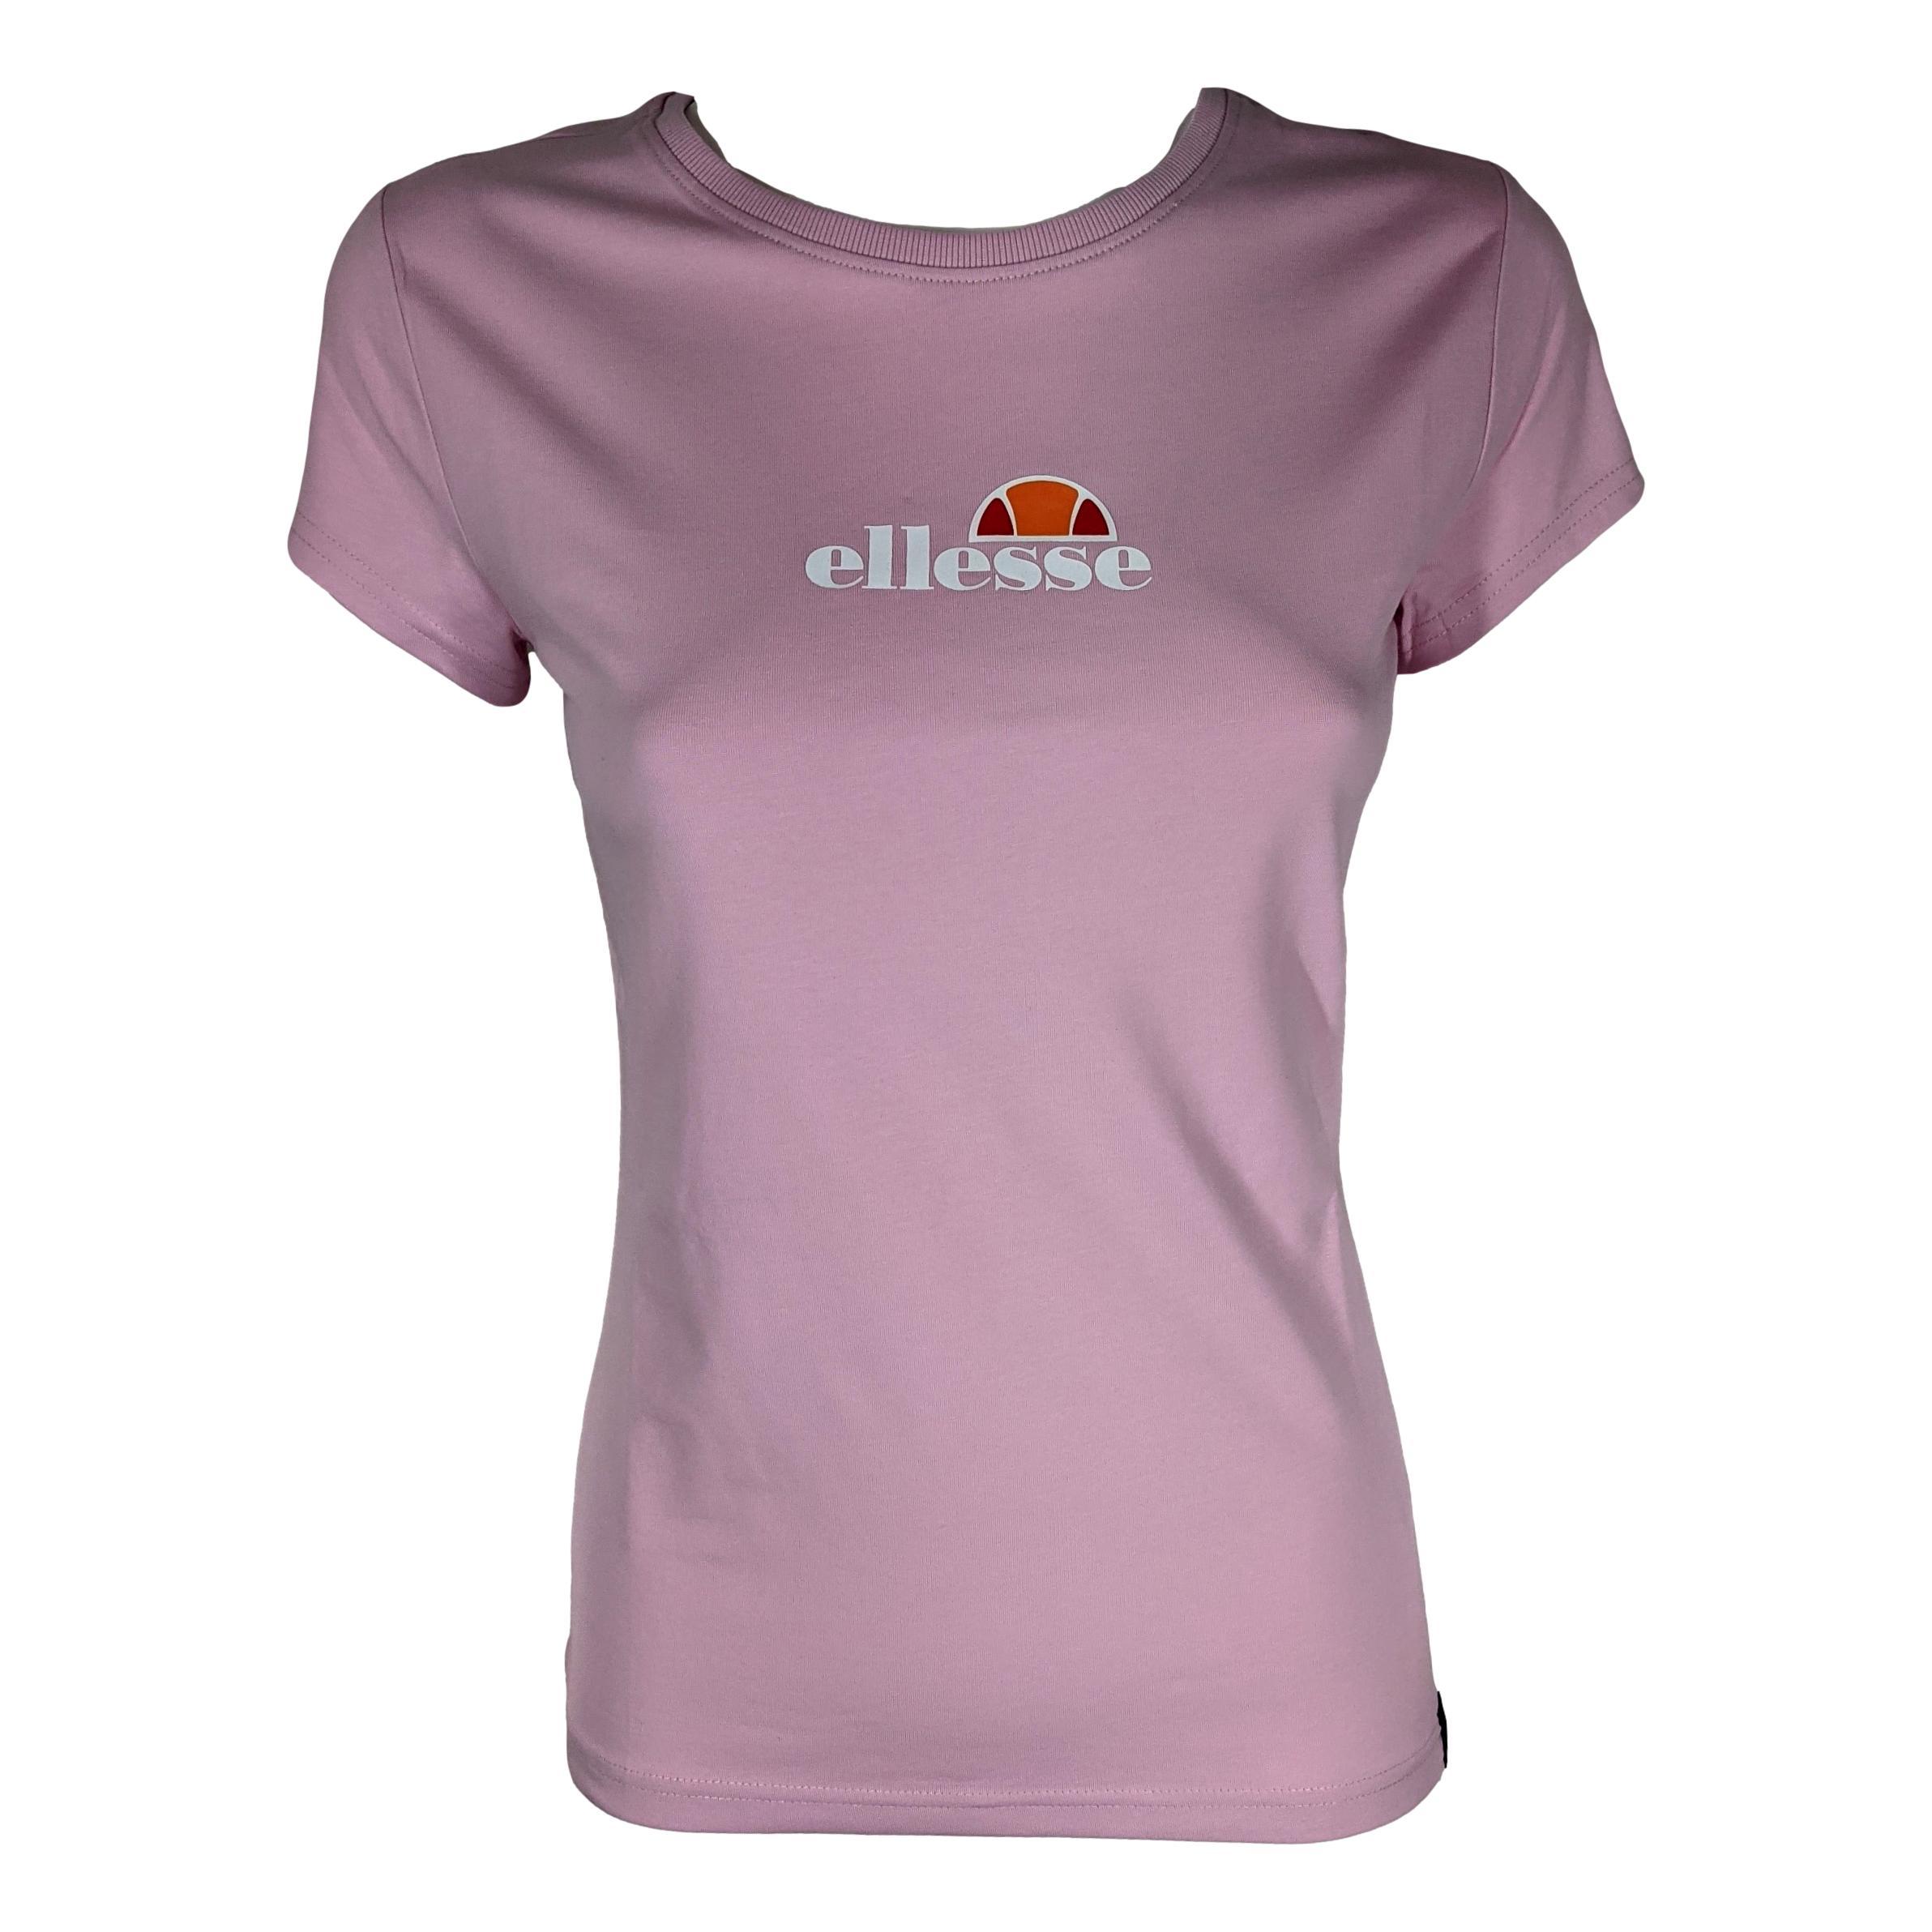 ellesse t-shirt ELLESSE |  | EHW902CO378